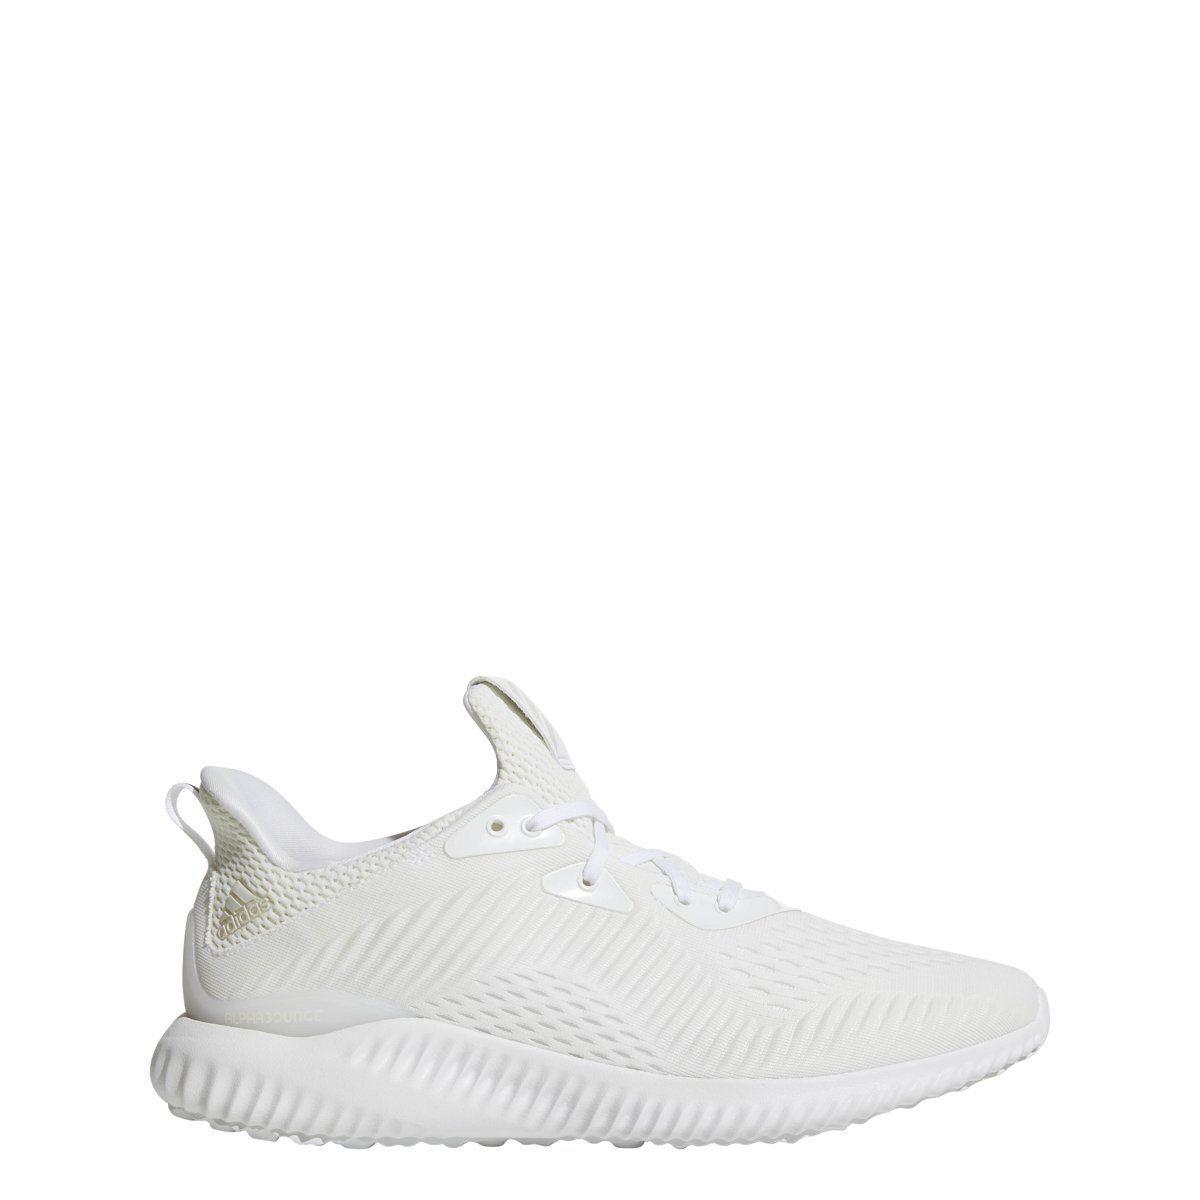 Adidas Men S Alphabounce Em M Running Shoe By4426 Adidas Men